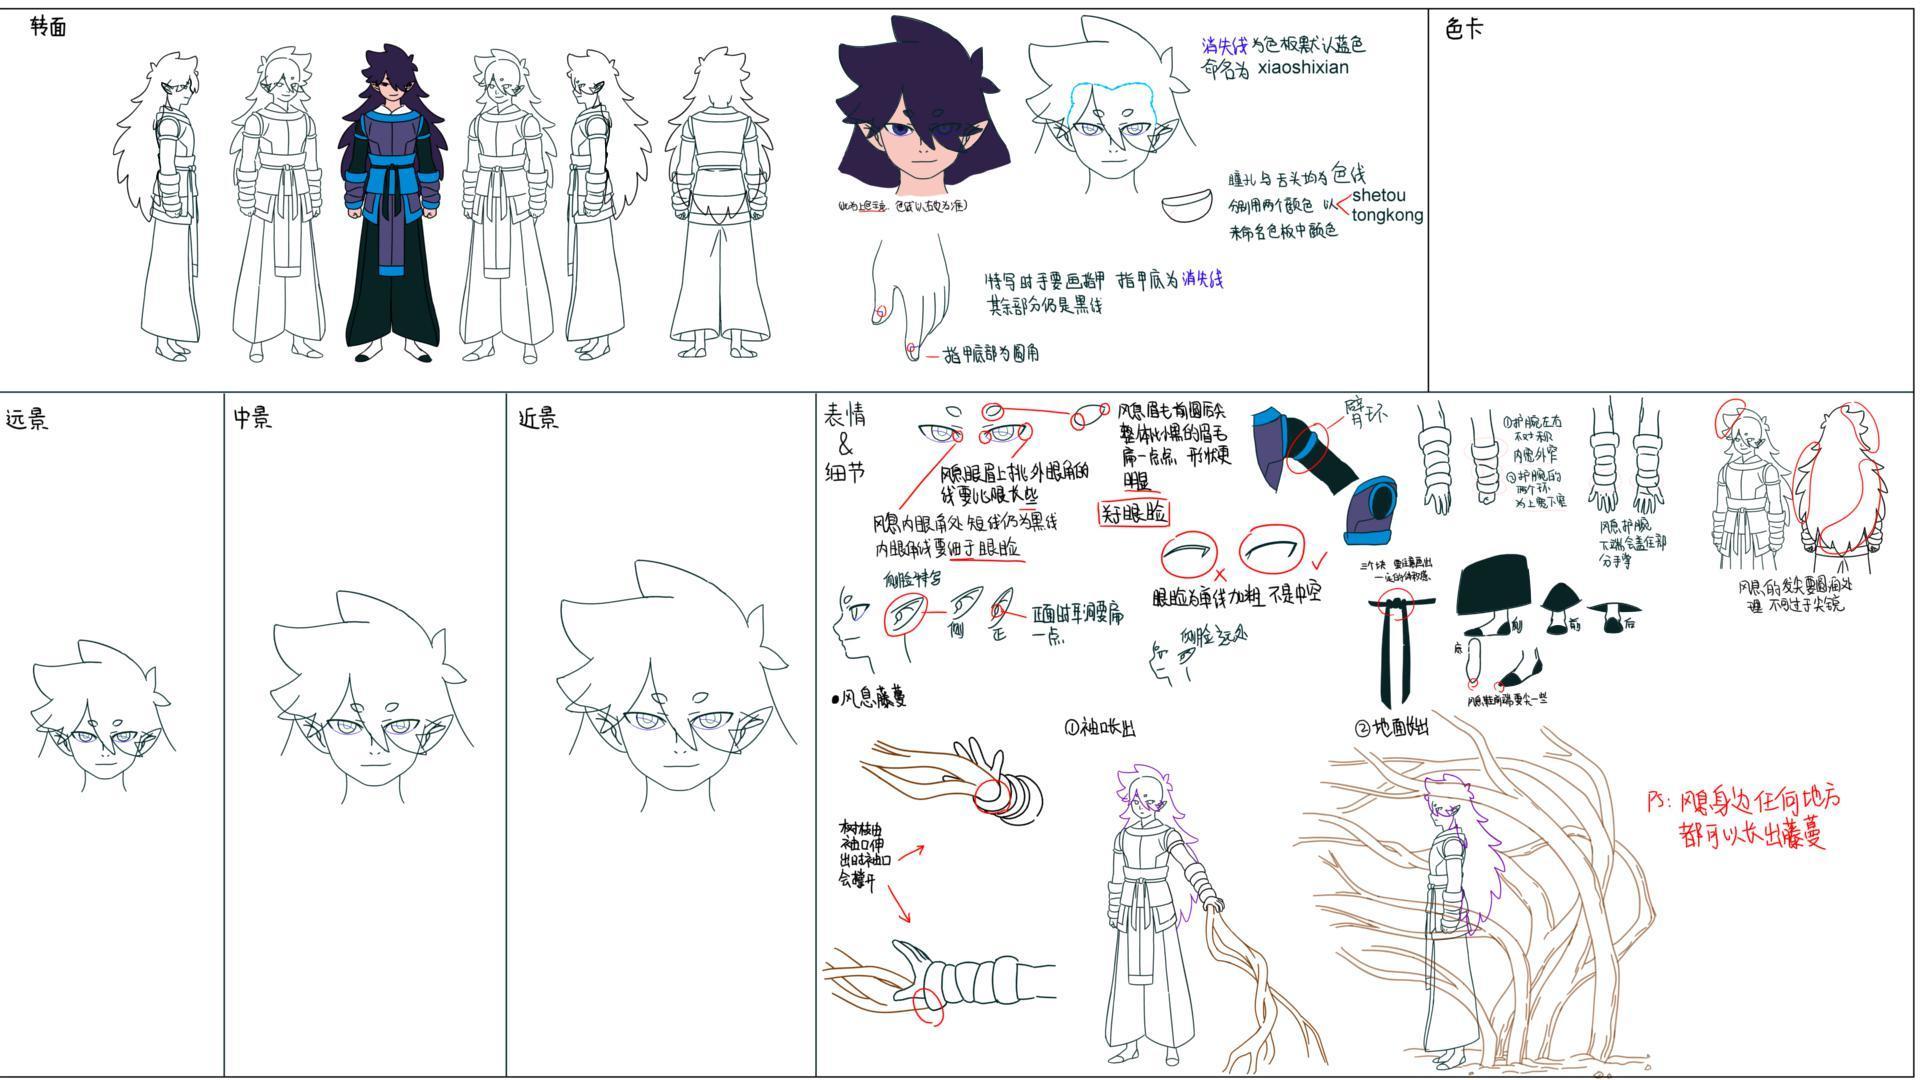 設定画〈フーシー〉 (C) Beijing HMCH Anime Co.,Ltd